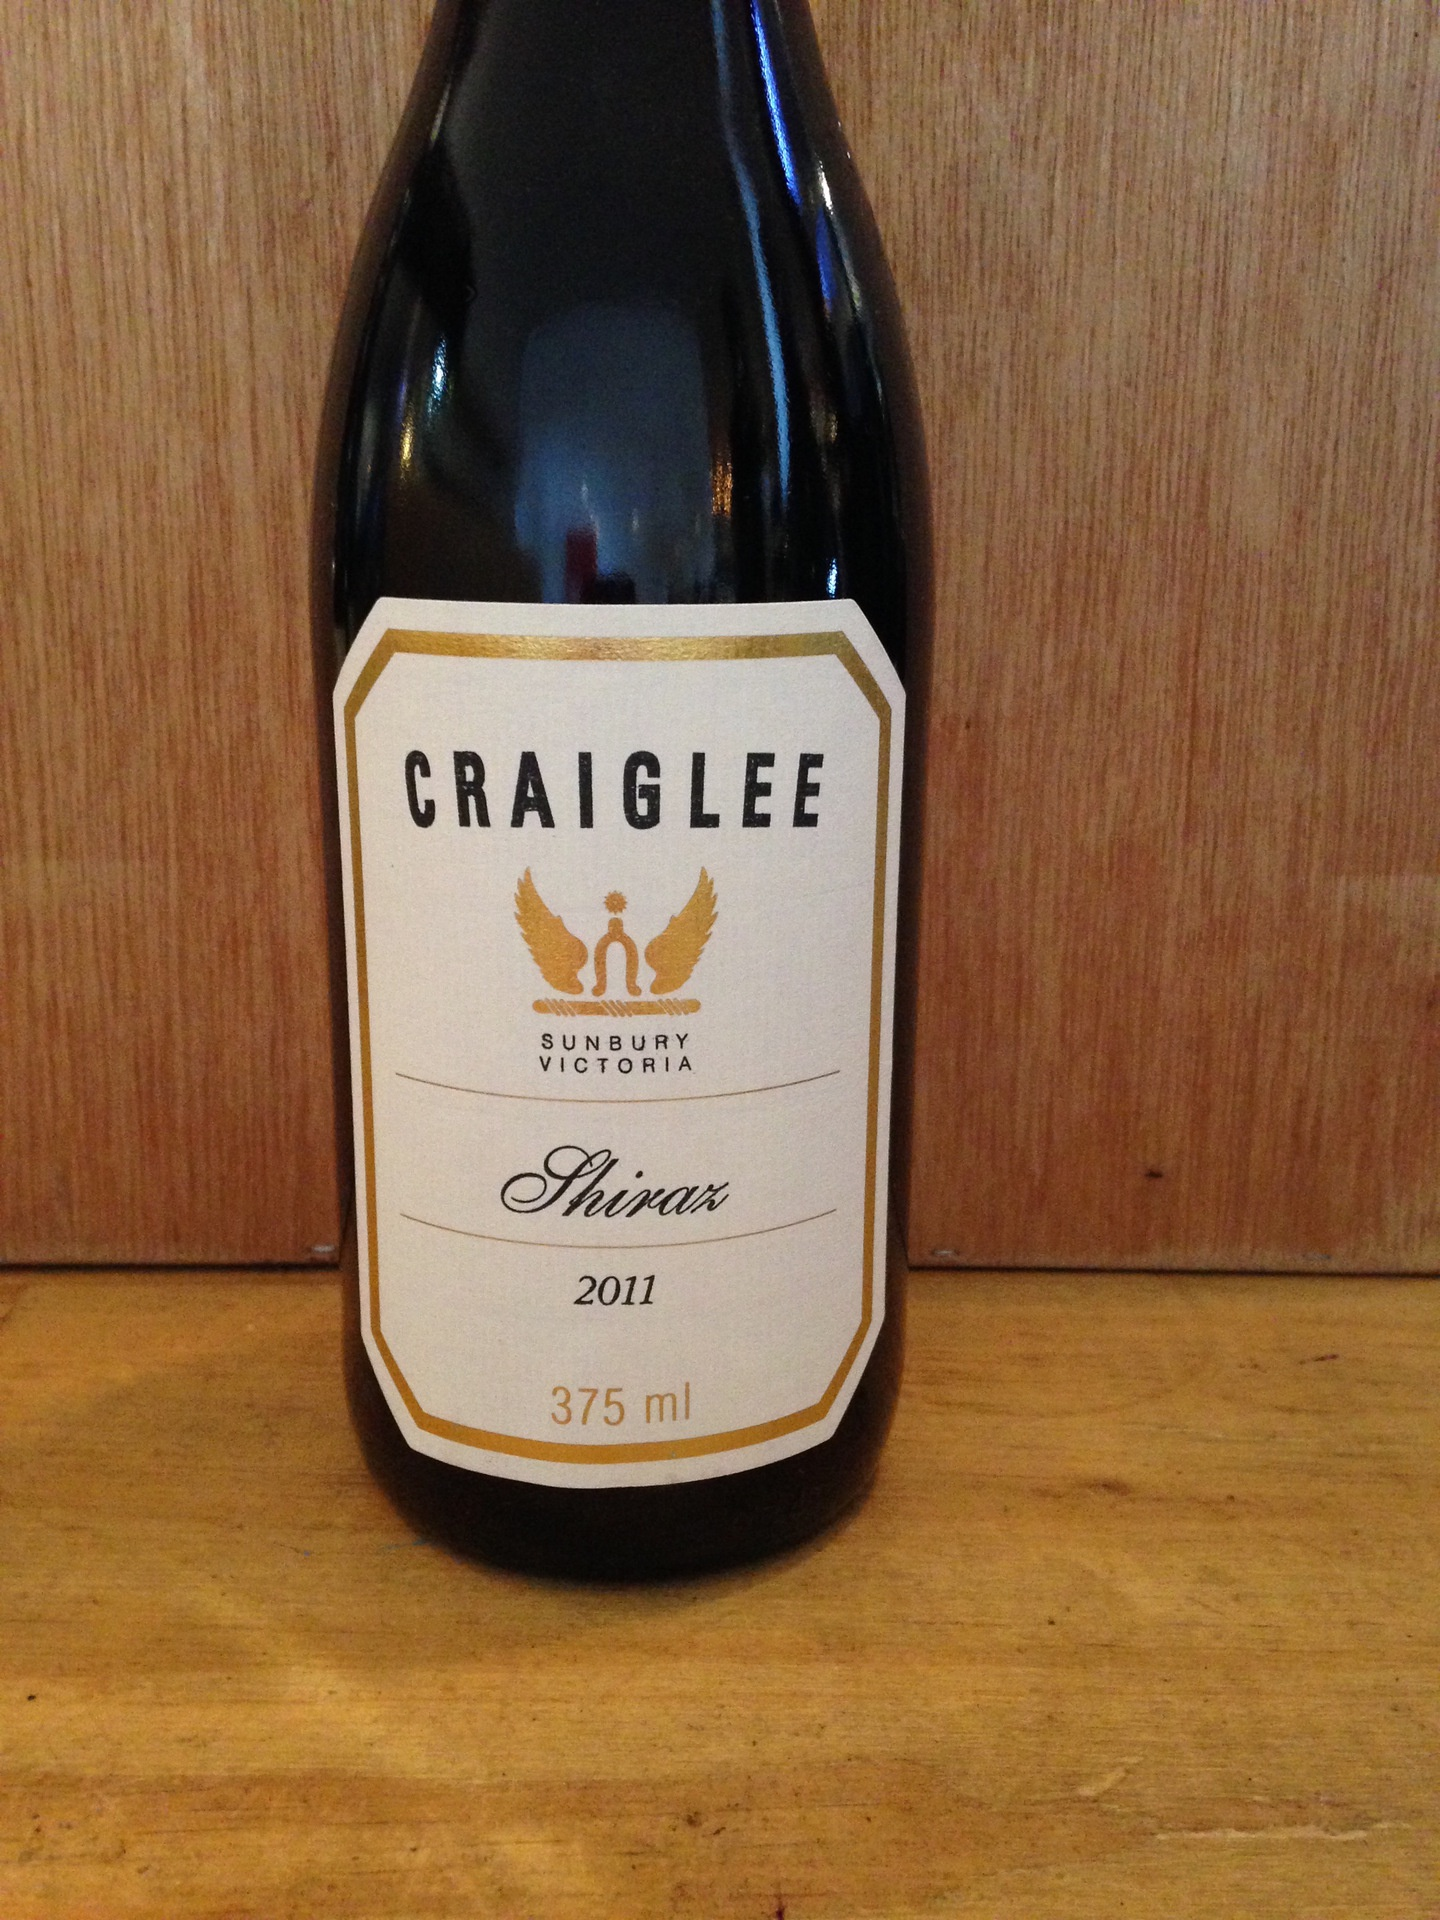 Craiglee Shiraz 375ml